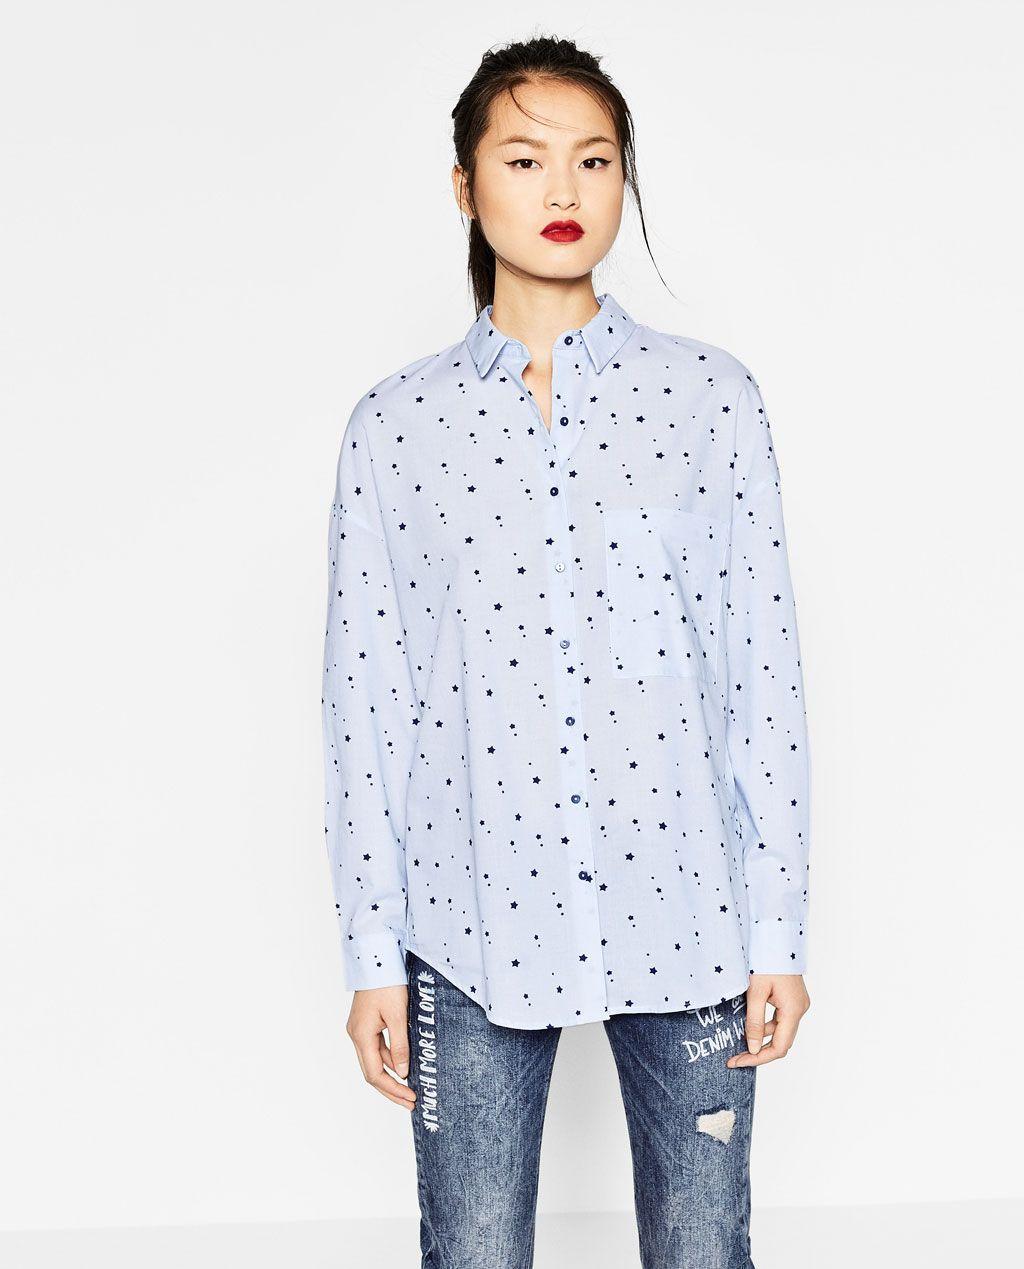 Mine Printed Trf Stars Of Pinterest Wardrobe Shirt Zara gTUqOwYw